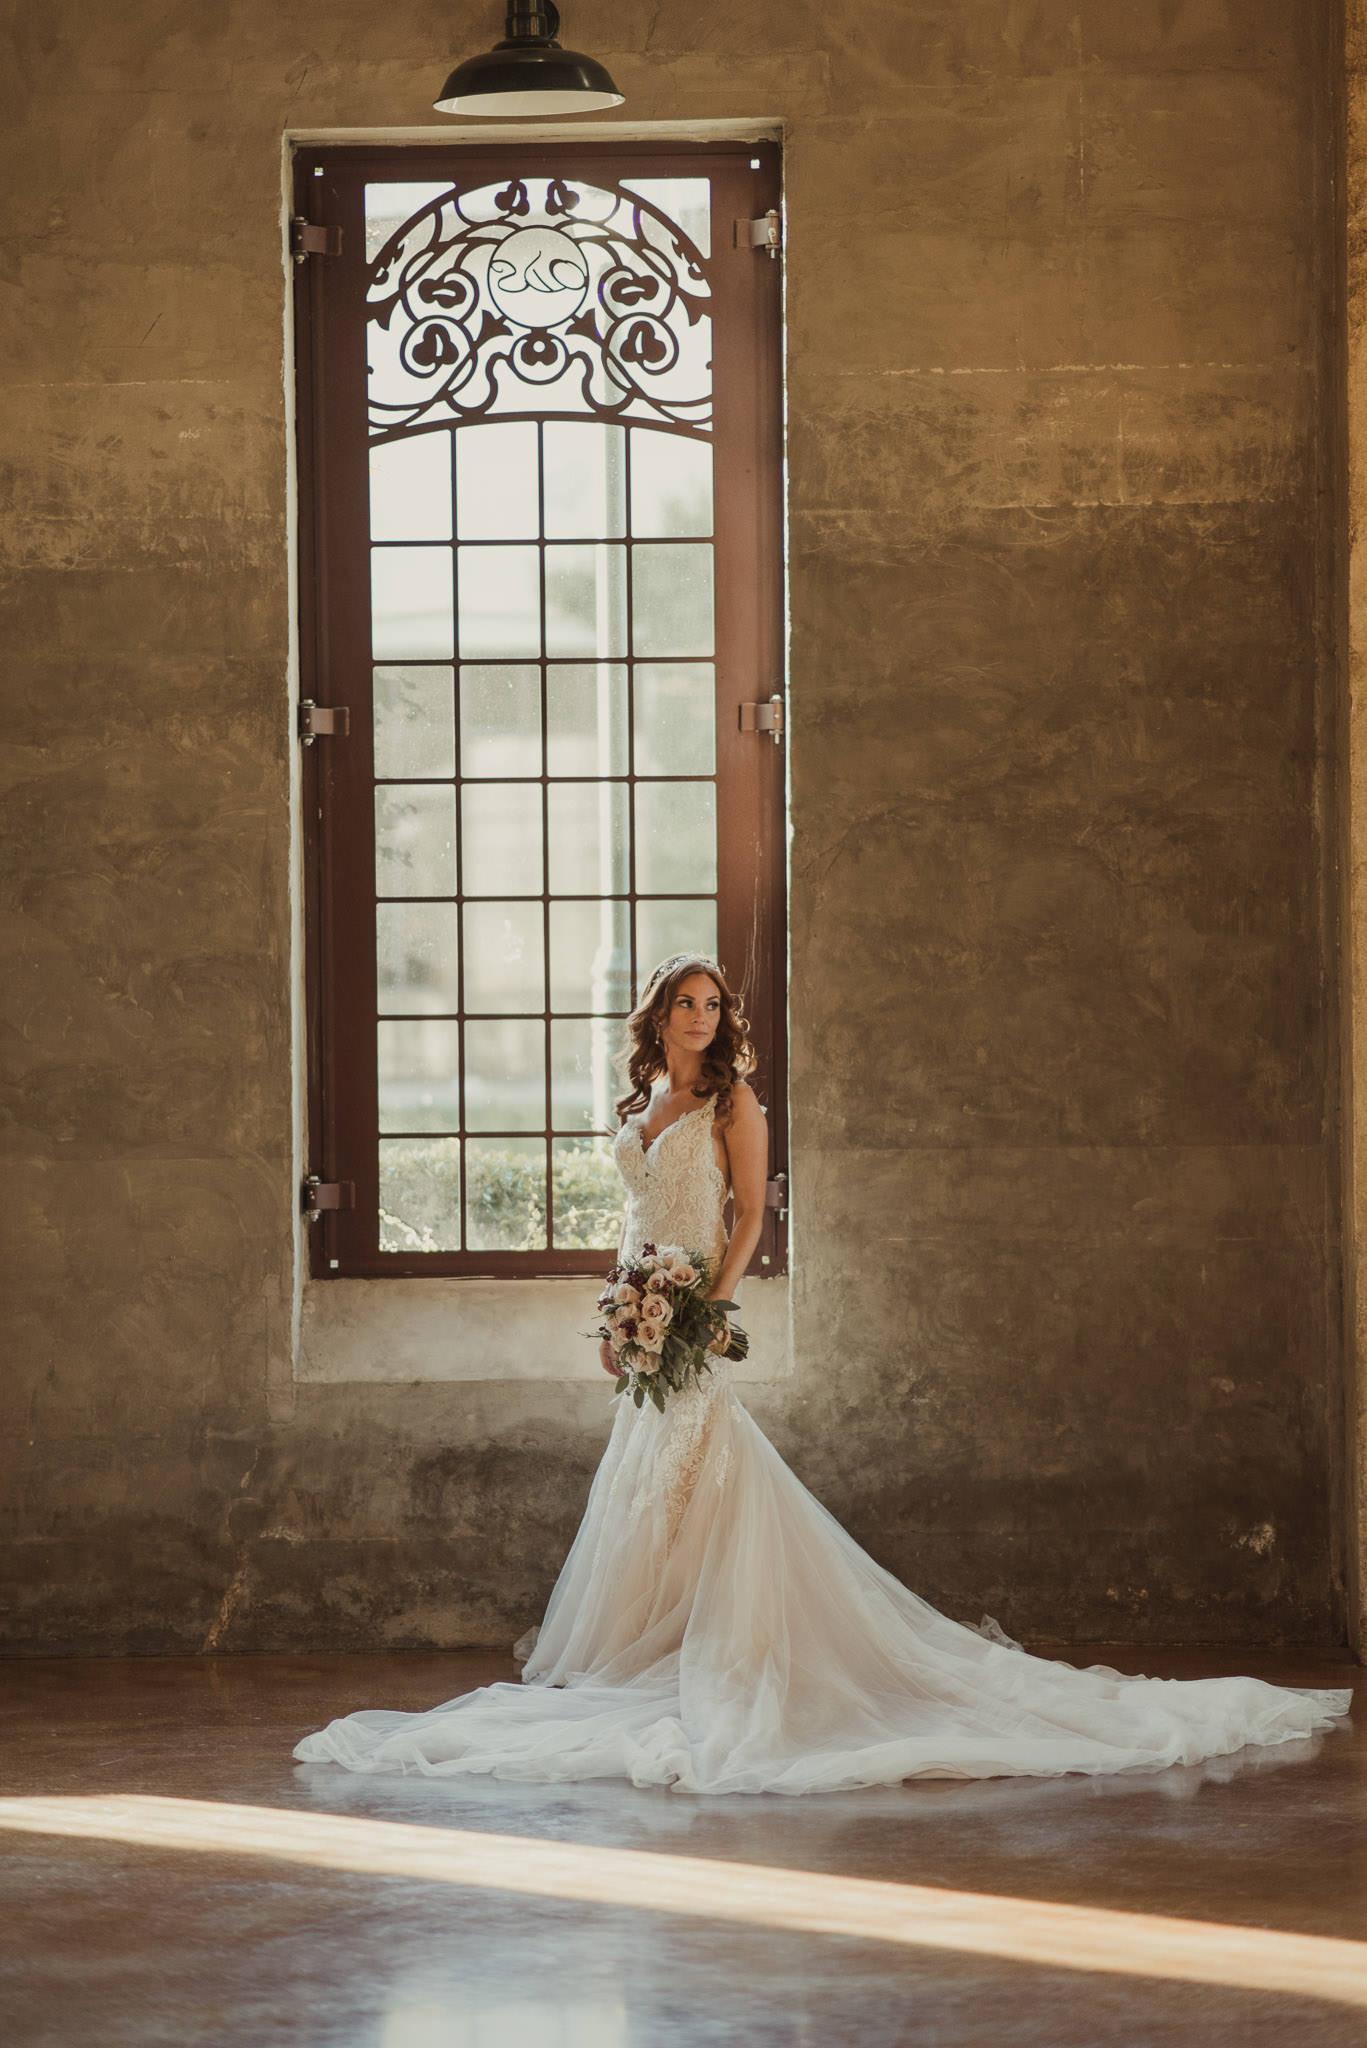 Cynthia-Curtis-Olde-Dobbine-Station-Houston-Wedding-Photographer-sm-54.jpg